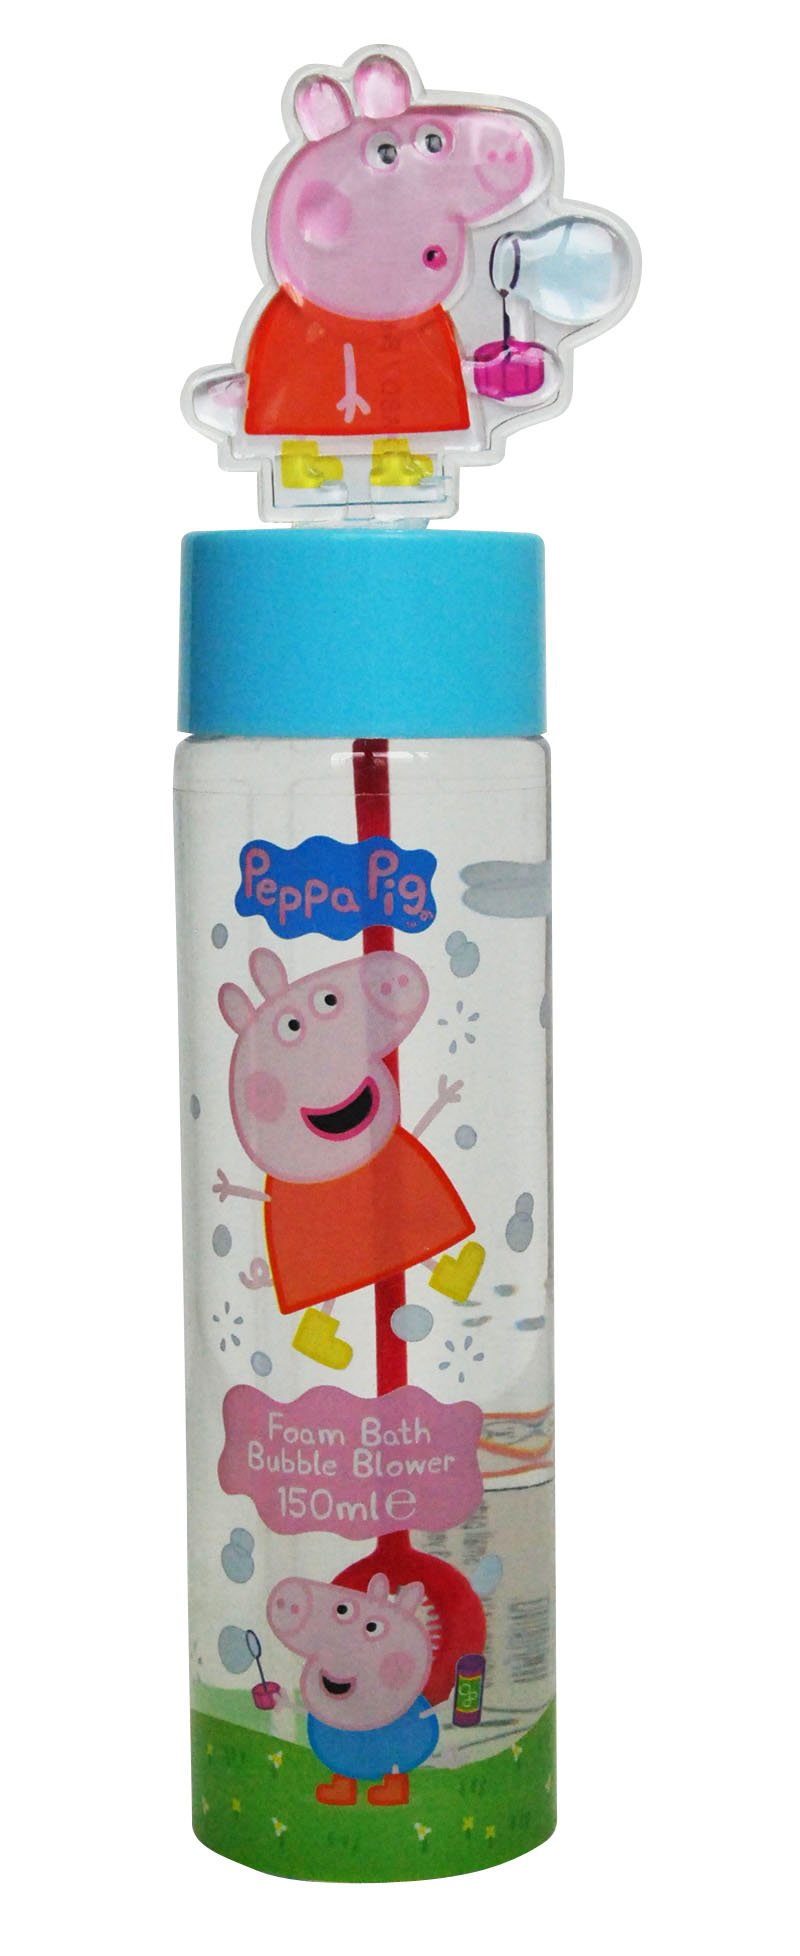 Peppa Pig Bubble Blower Bubble Bath